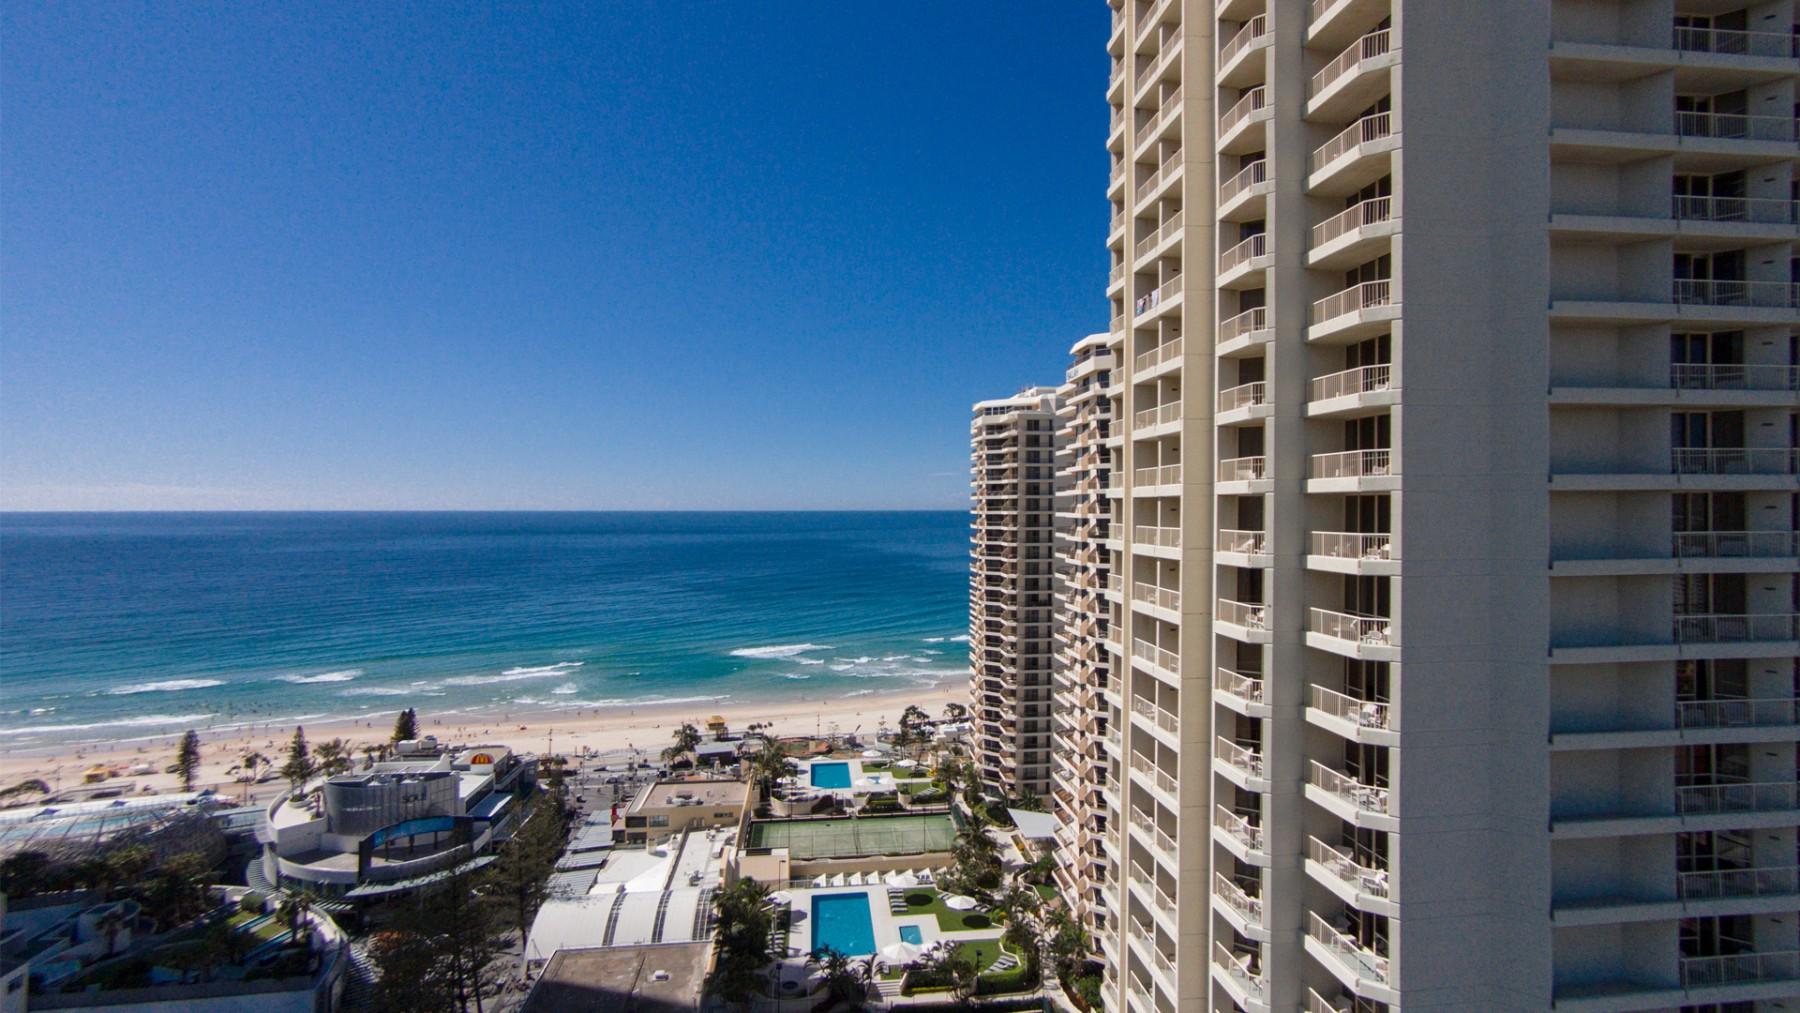 novotel surfers paradise gold coast accommodation accorhotels. Black Bedroom Furniture Sets. Home Design Ideas